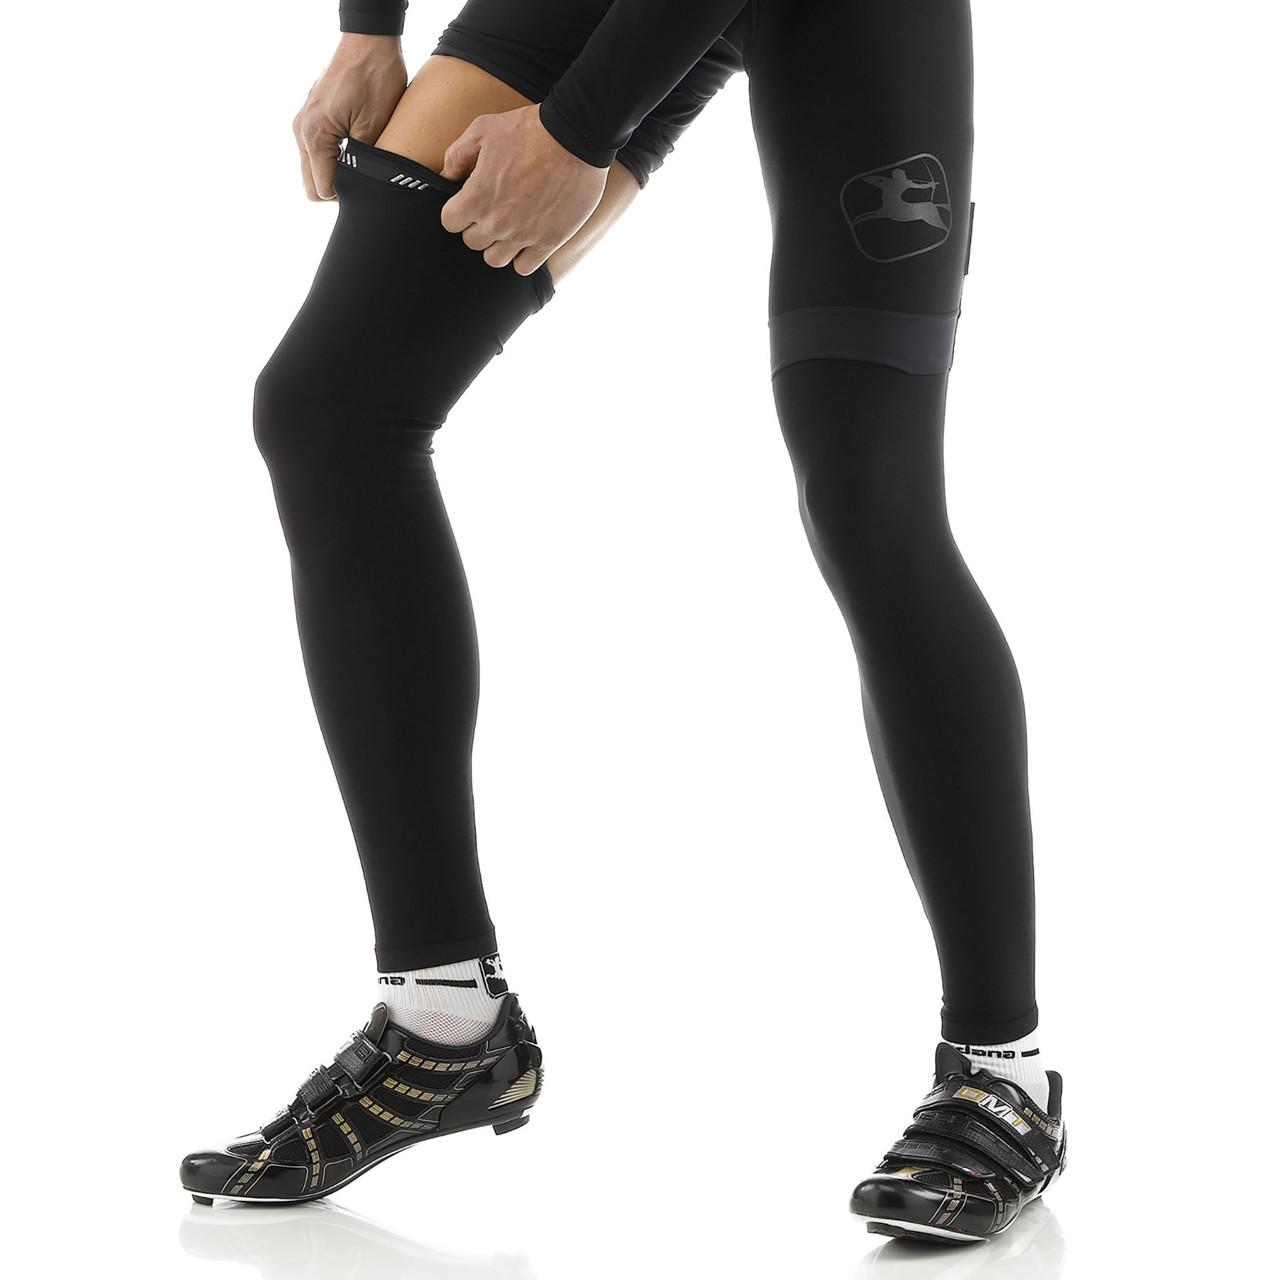 Giordana Giordana Benvarmere G-Shield Cykel Tilbehør||> Cykeltøj||> Giordana Cykeltøj||Cykelbeklædning